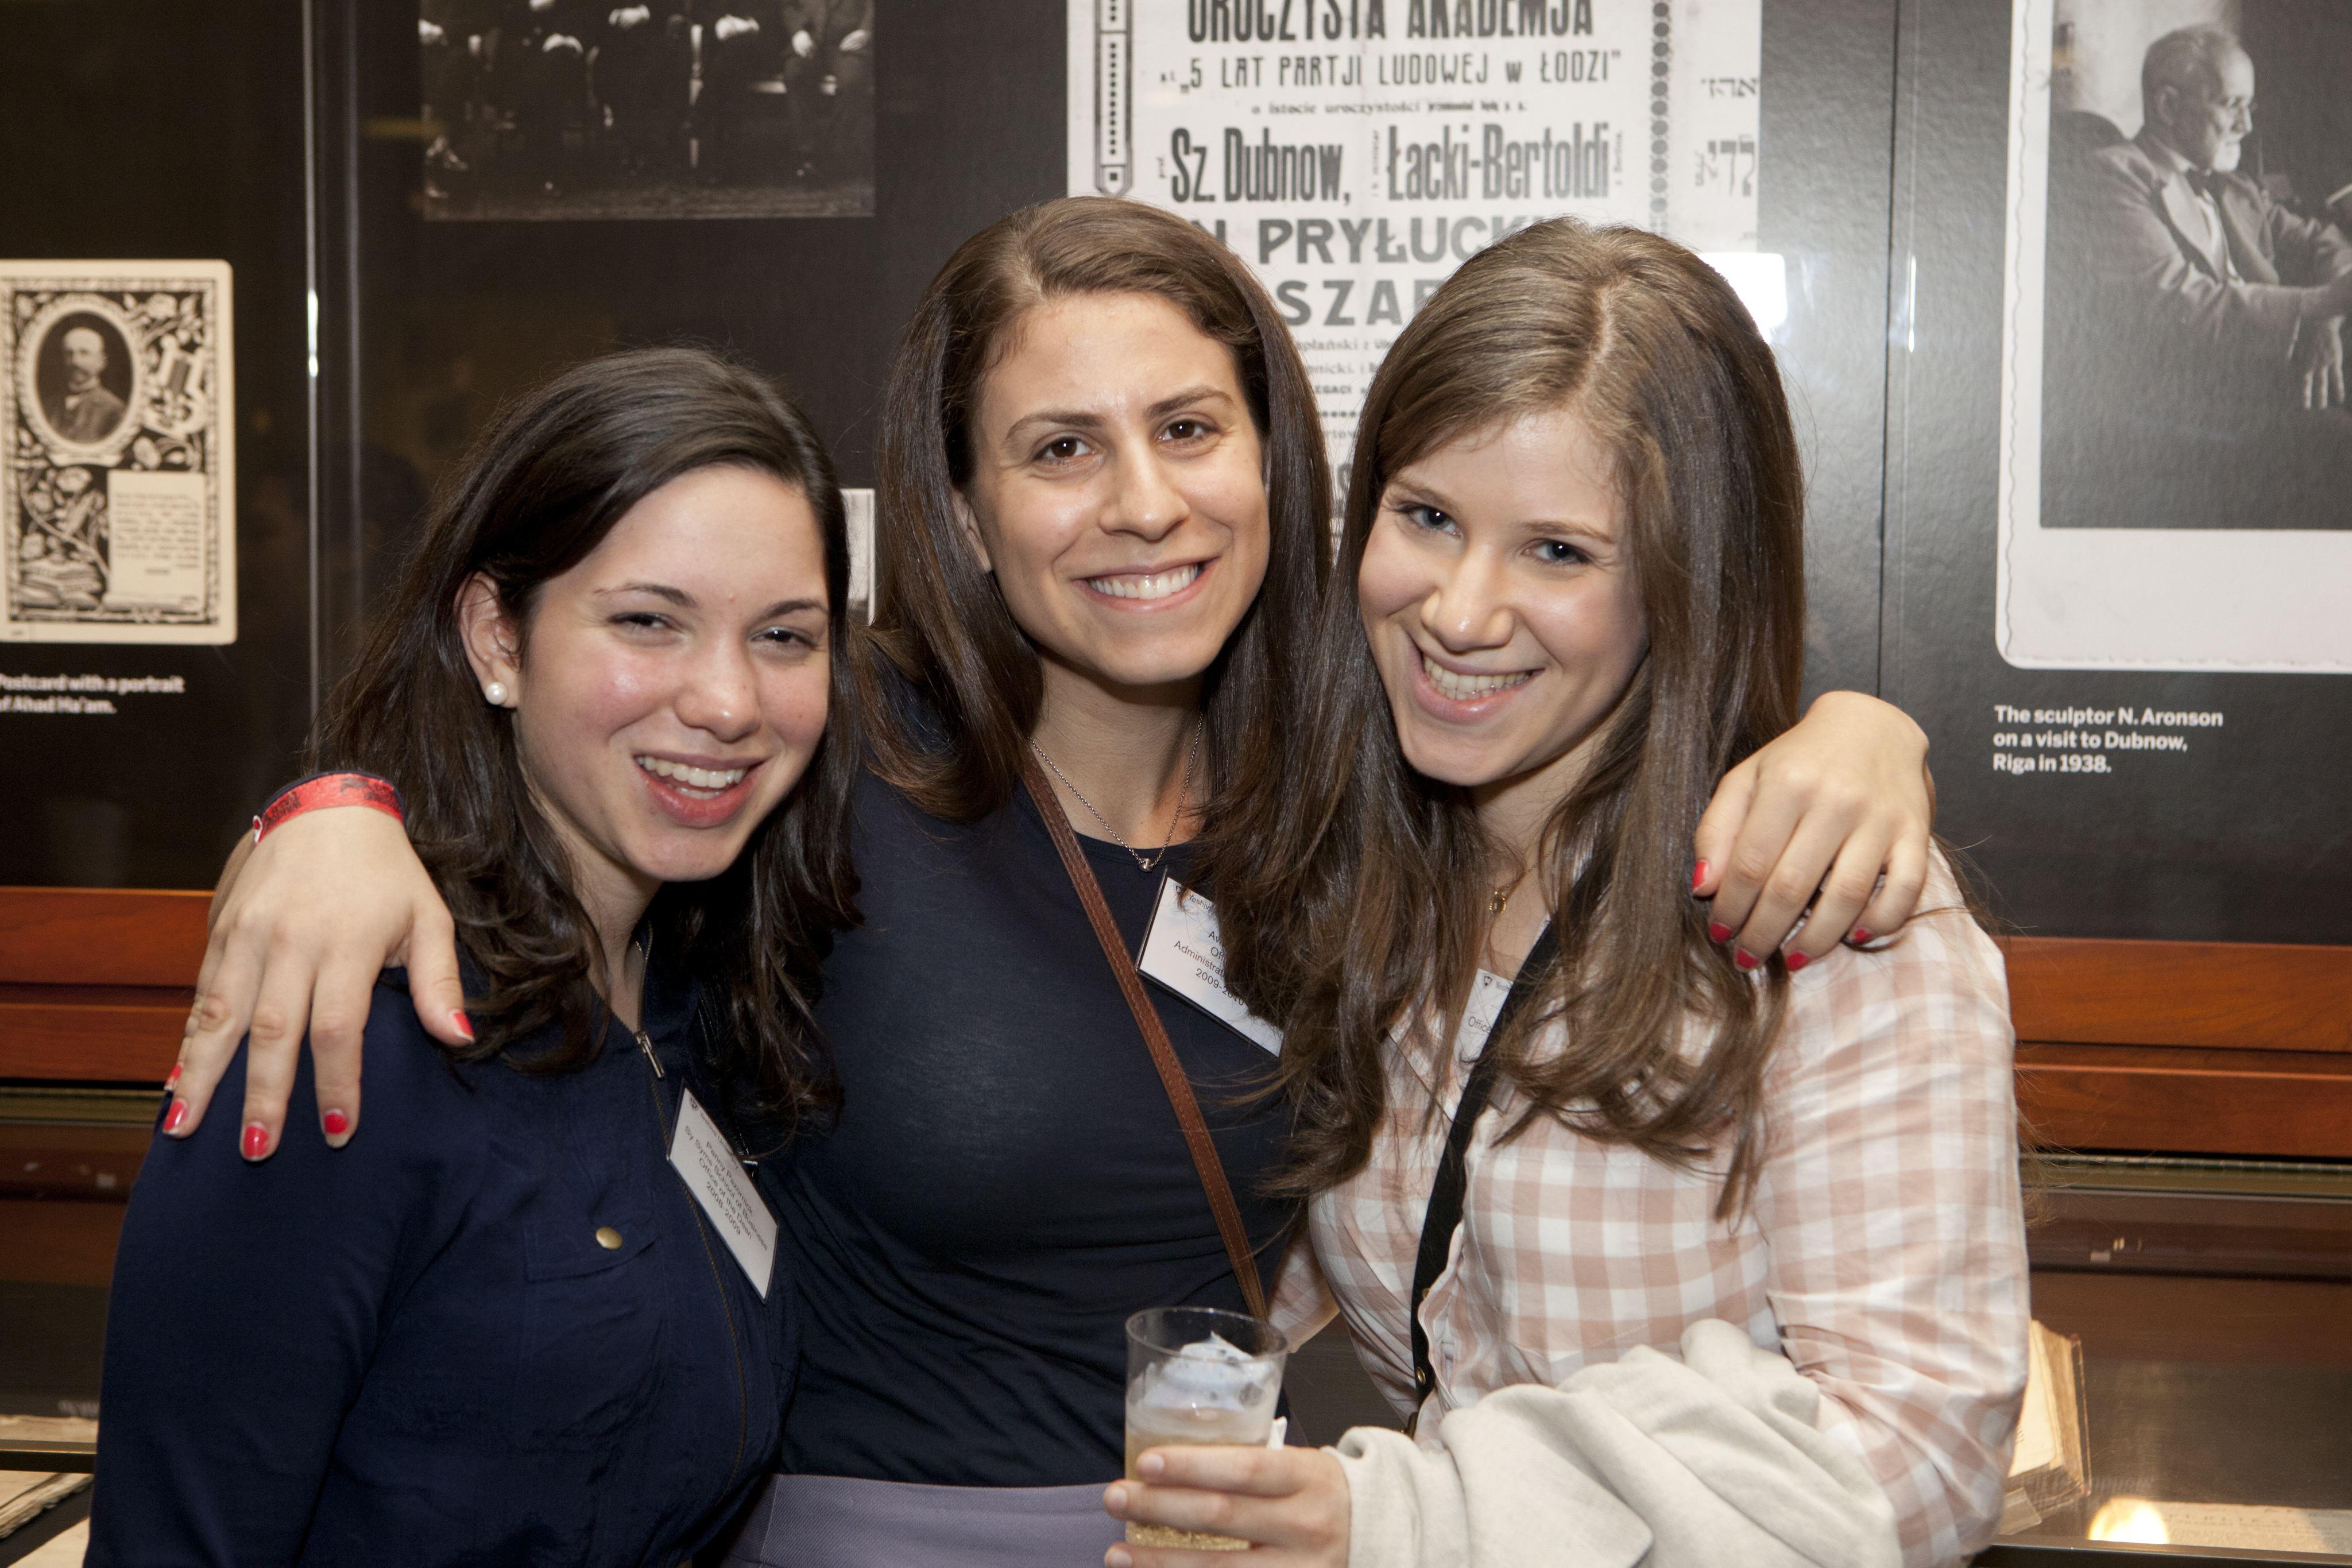 Former fellows Penny Pazornick, Aviva Miller and Esther Goldstein.